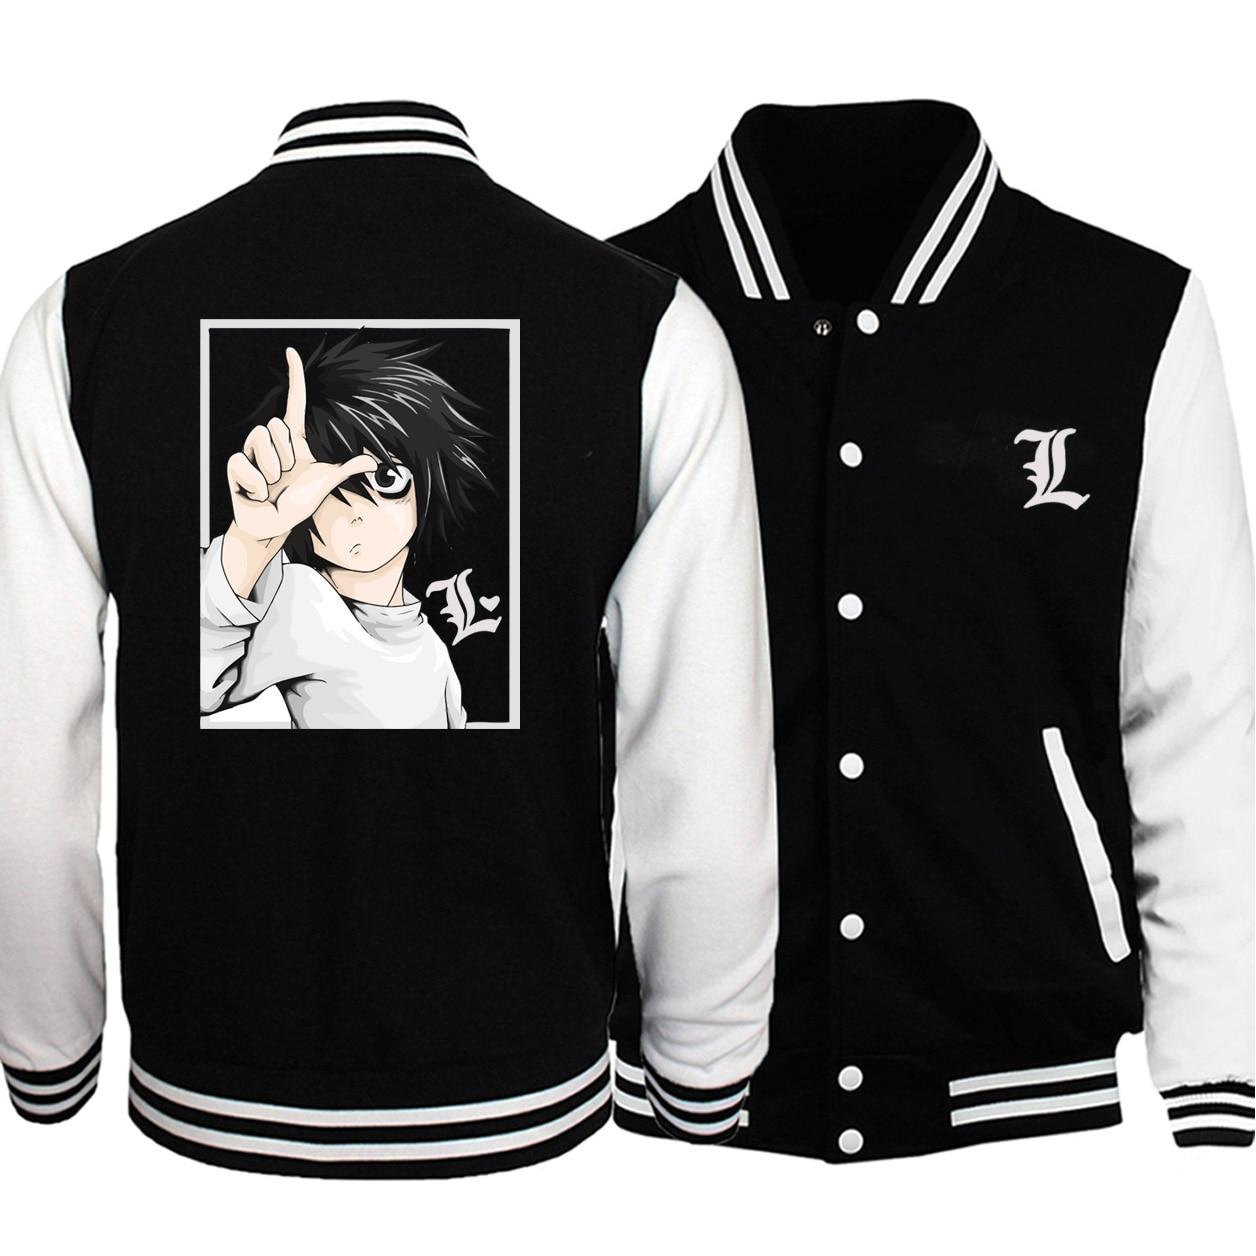 2020 Men New Japanese Anime Death Note Trend Baseball Jackets Big Size Sweatshirt Autumn Winter Streetwear White Coats Jacket